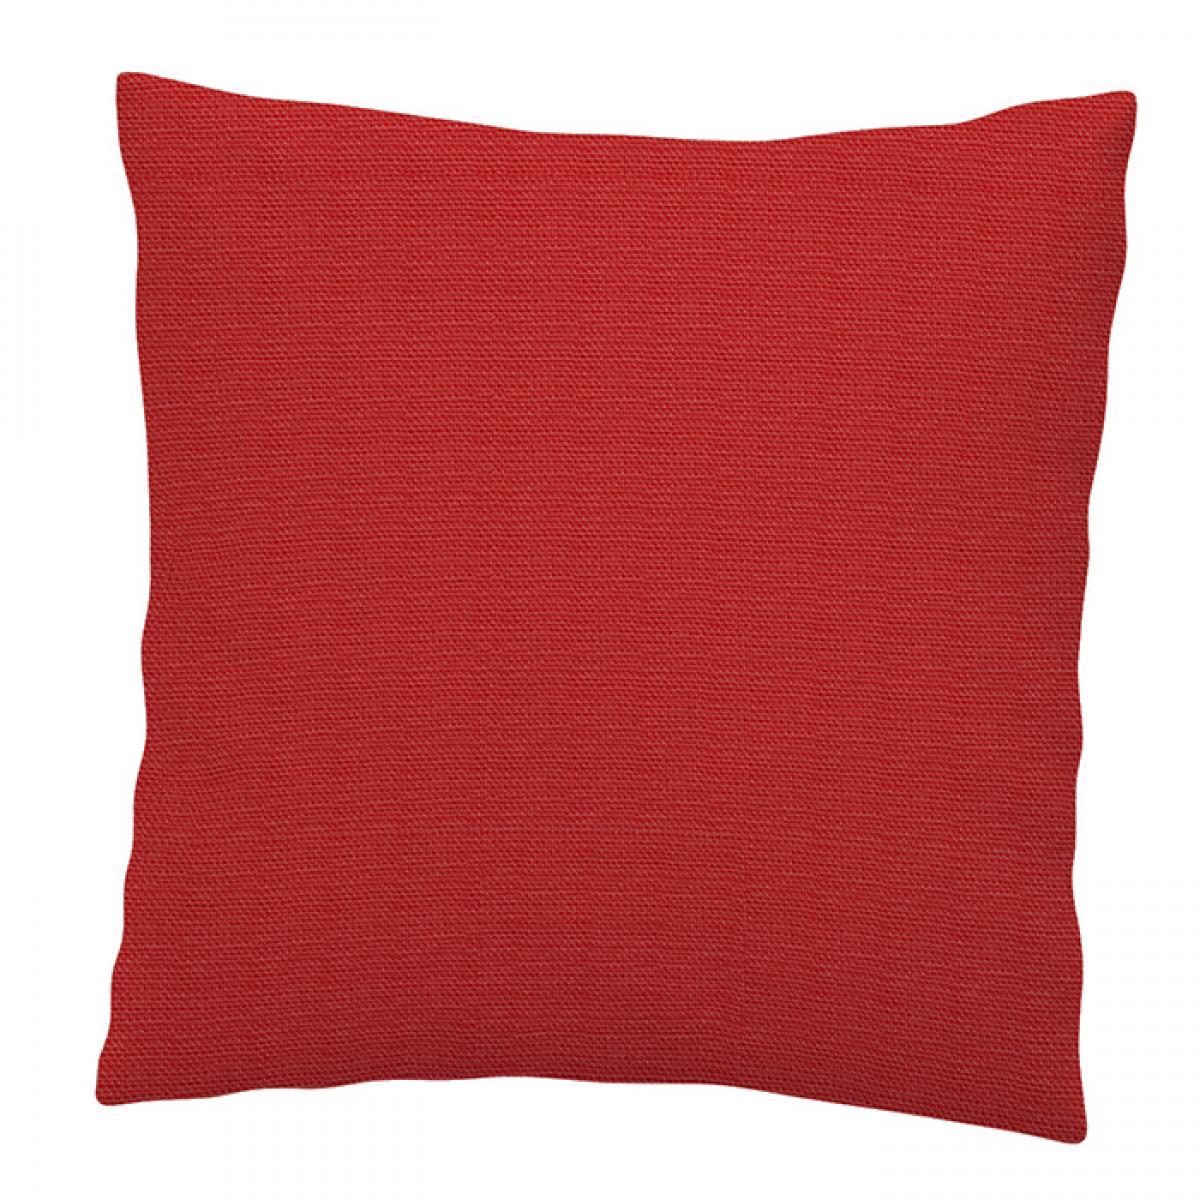 Red pillowcase without embroidery 40 * 40. Photo №1. | Narodnyi dim Ukraine